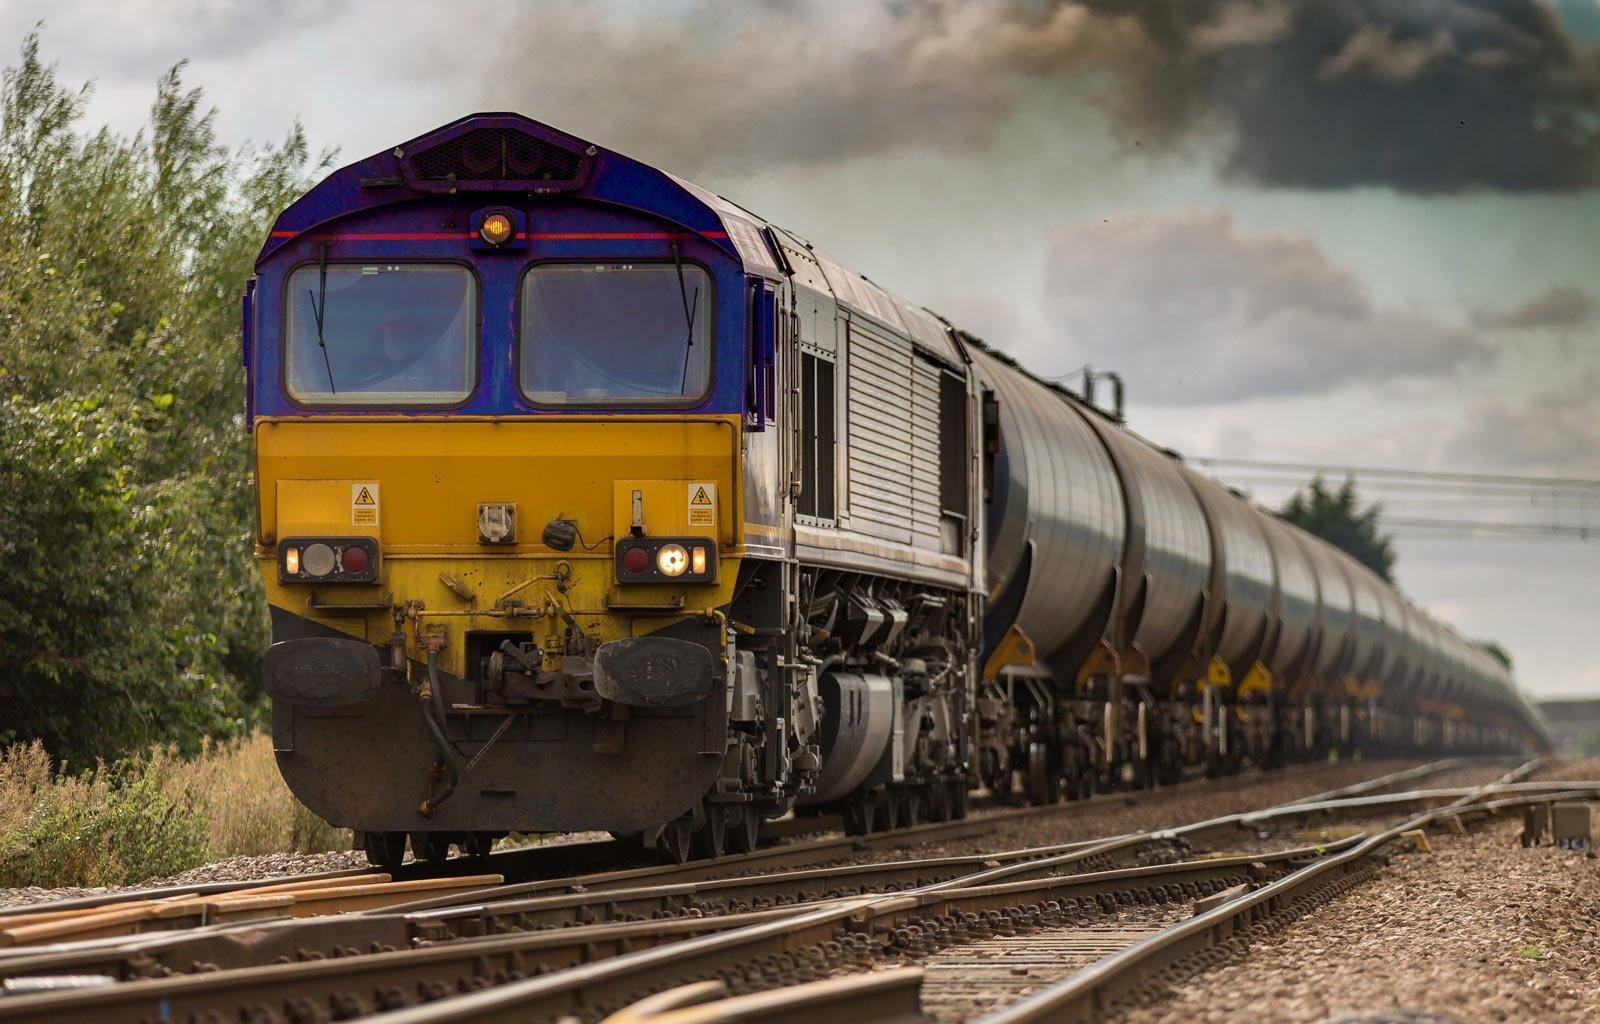 long trainsport freight train